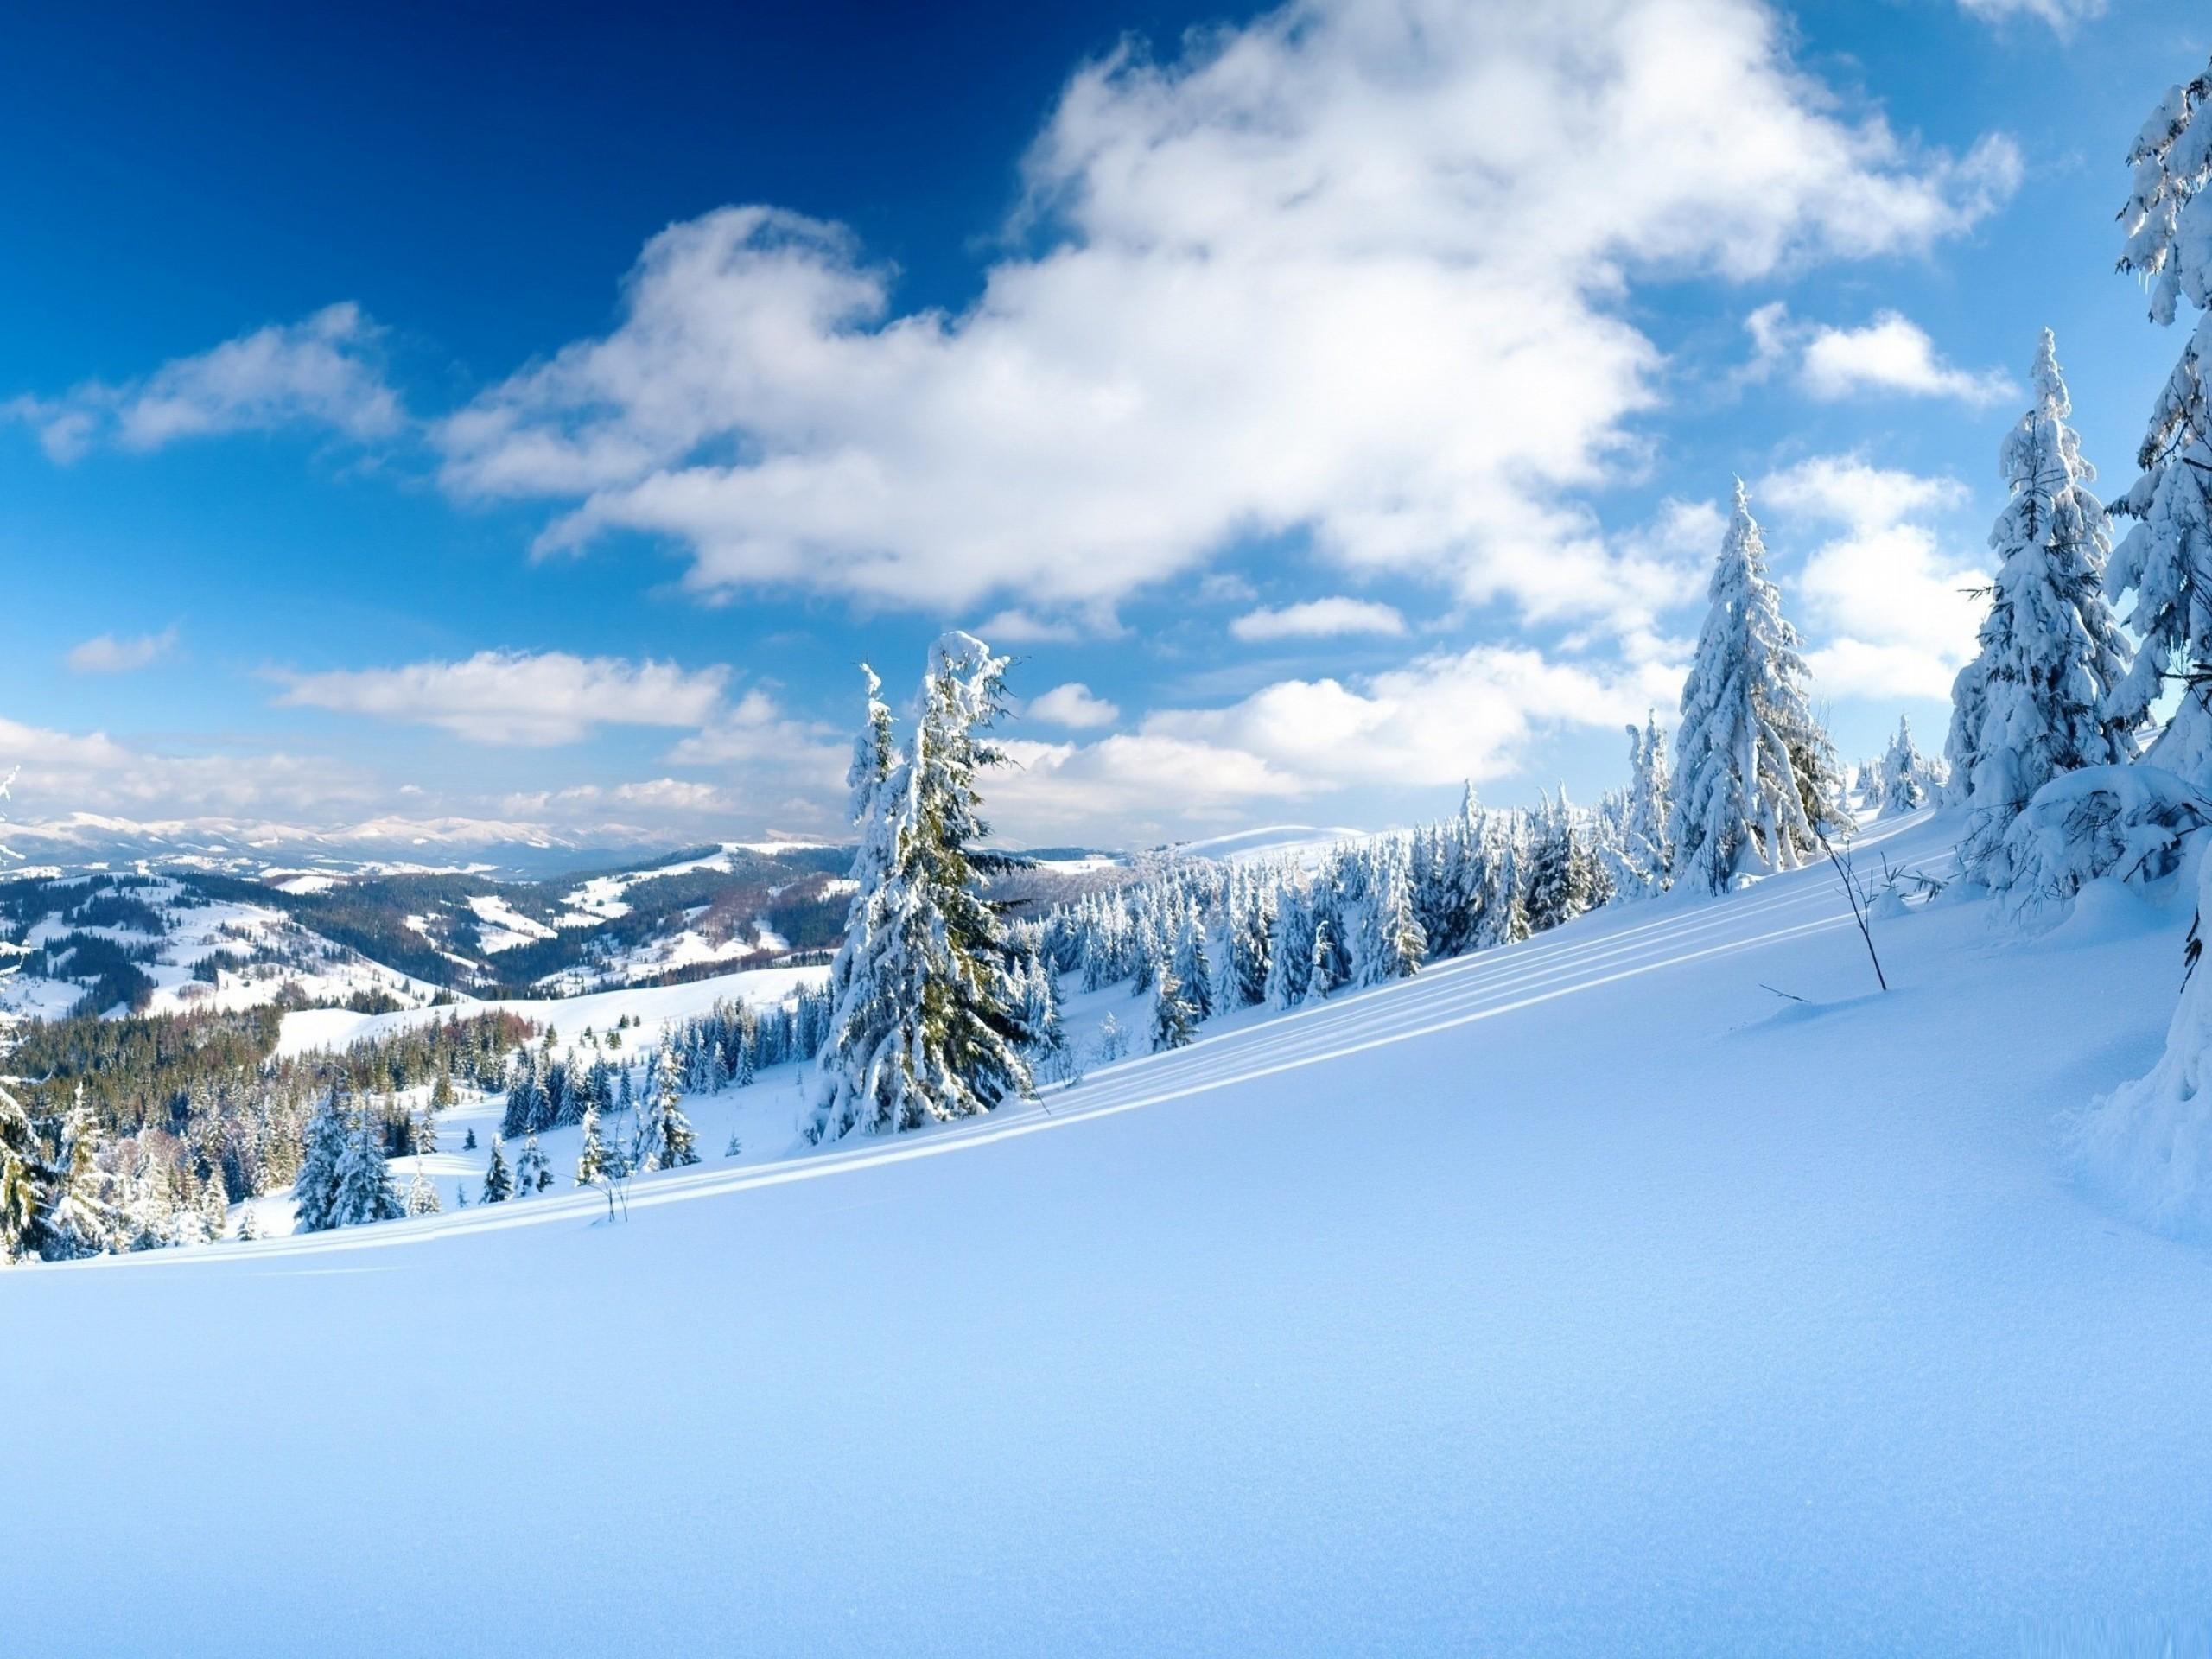 Winter Mountains Wallpaper   Winter Mountains 2560x1920